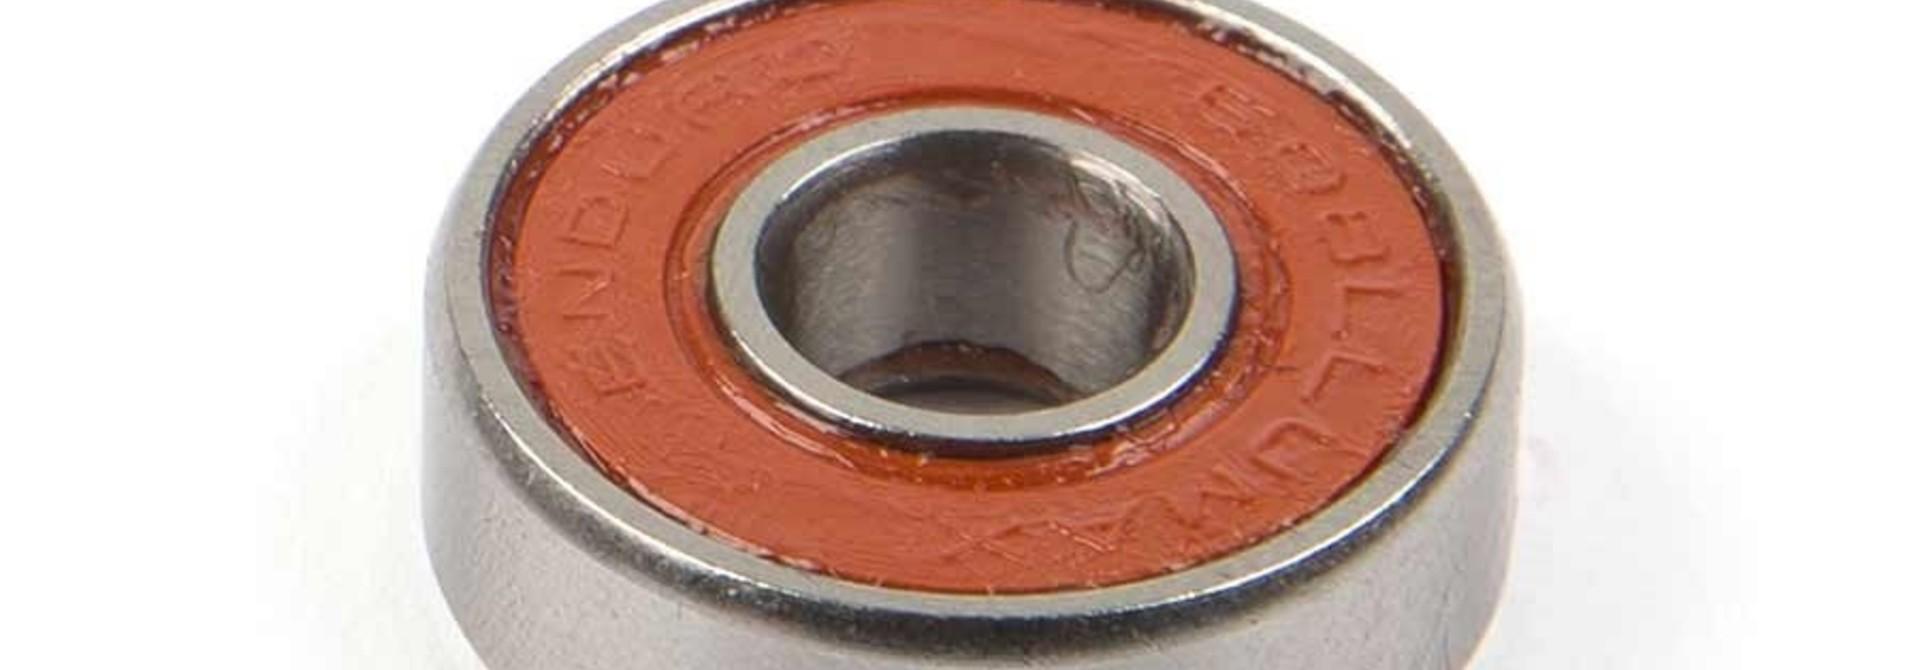 Enduro, Max, Cartridge bearing, 608 2RS, 8X22X7mm